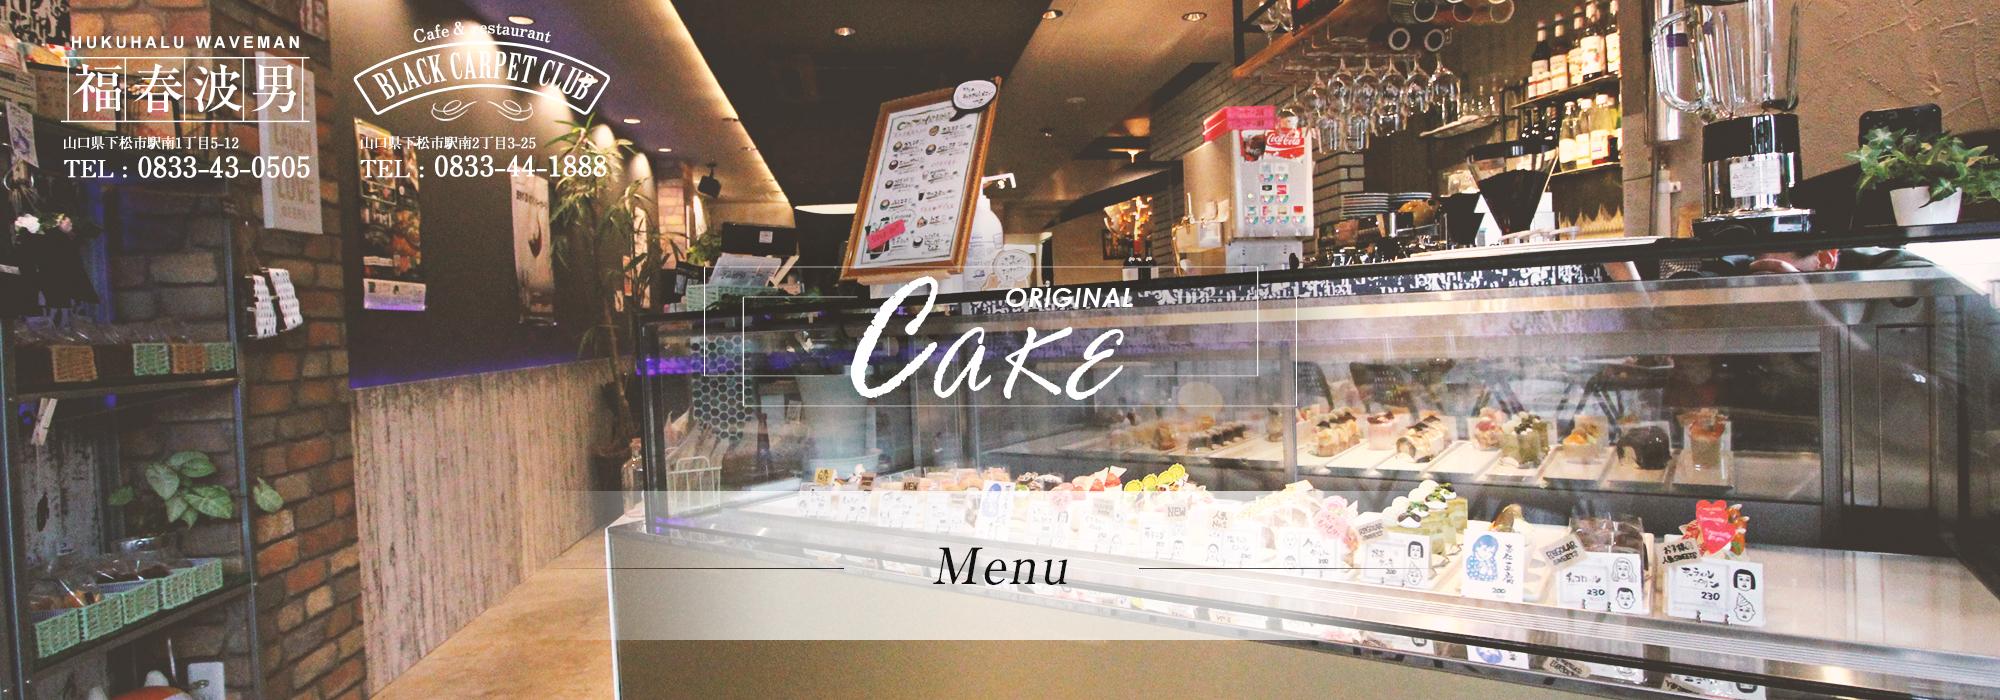 Menu/Cake